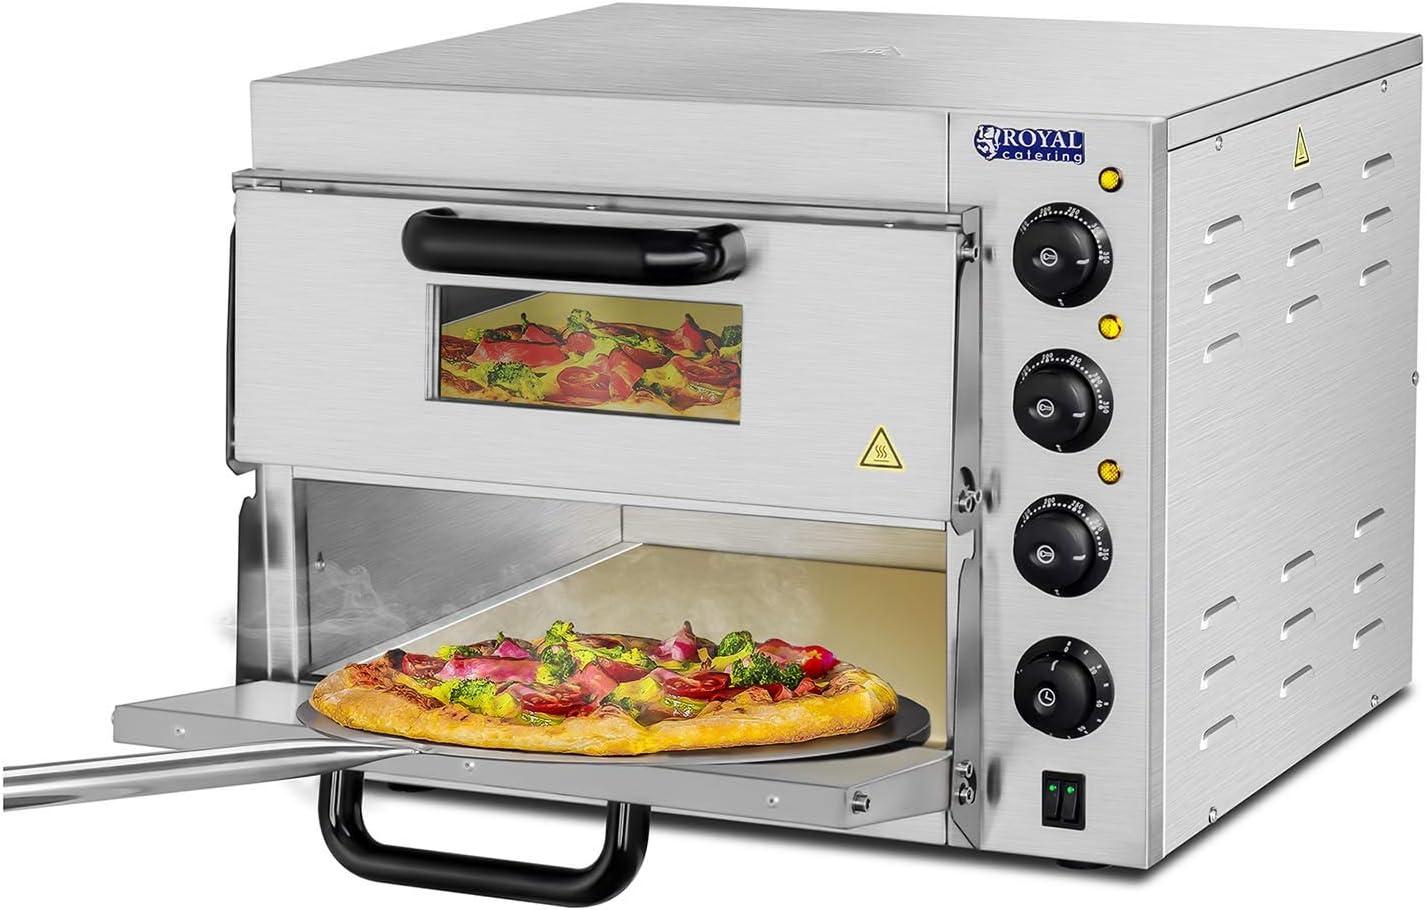 Royal Catering - RCPO-3000-2PS-1 - Horno para Pizza - 2 compartimientos - Arcilla refractaria 40x40x1,5cm